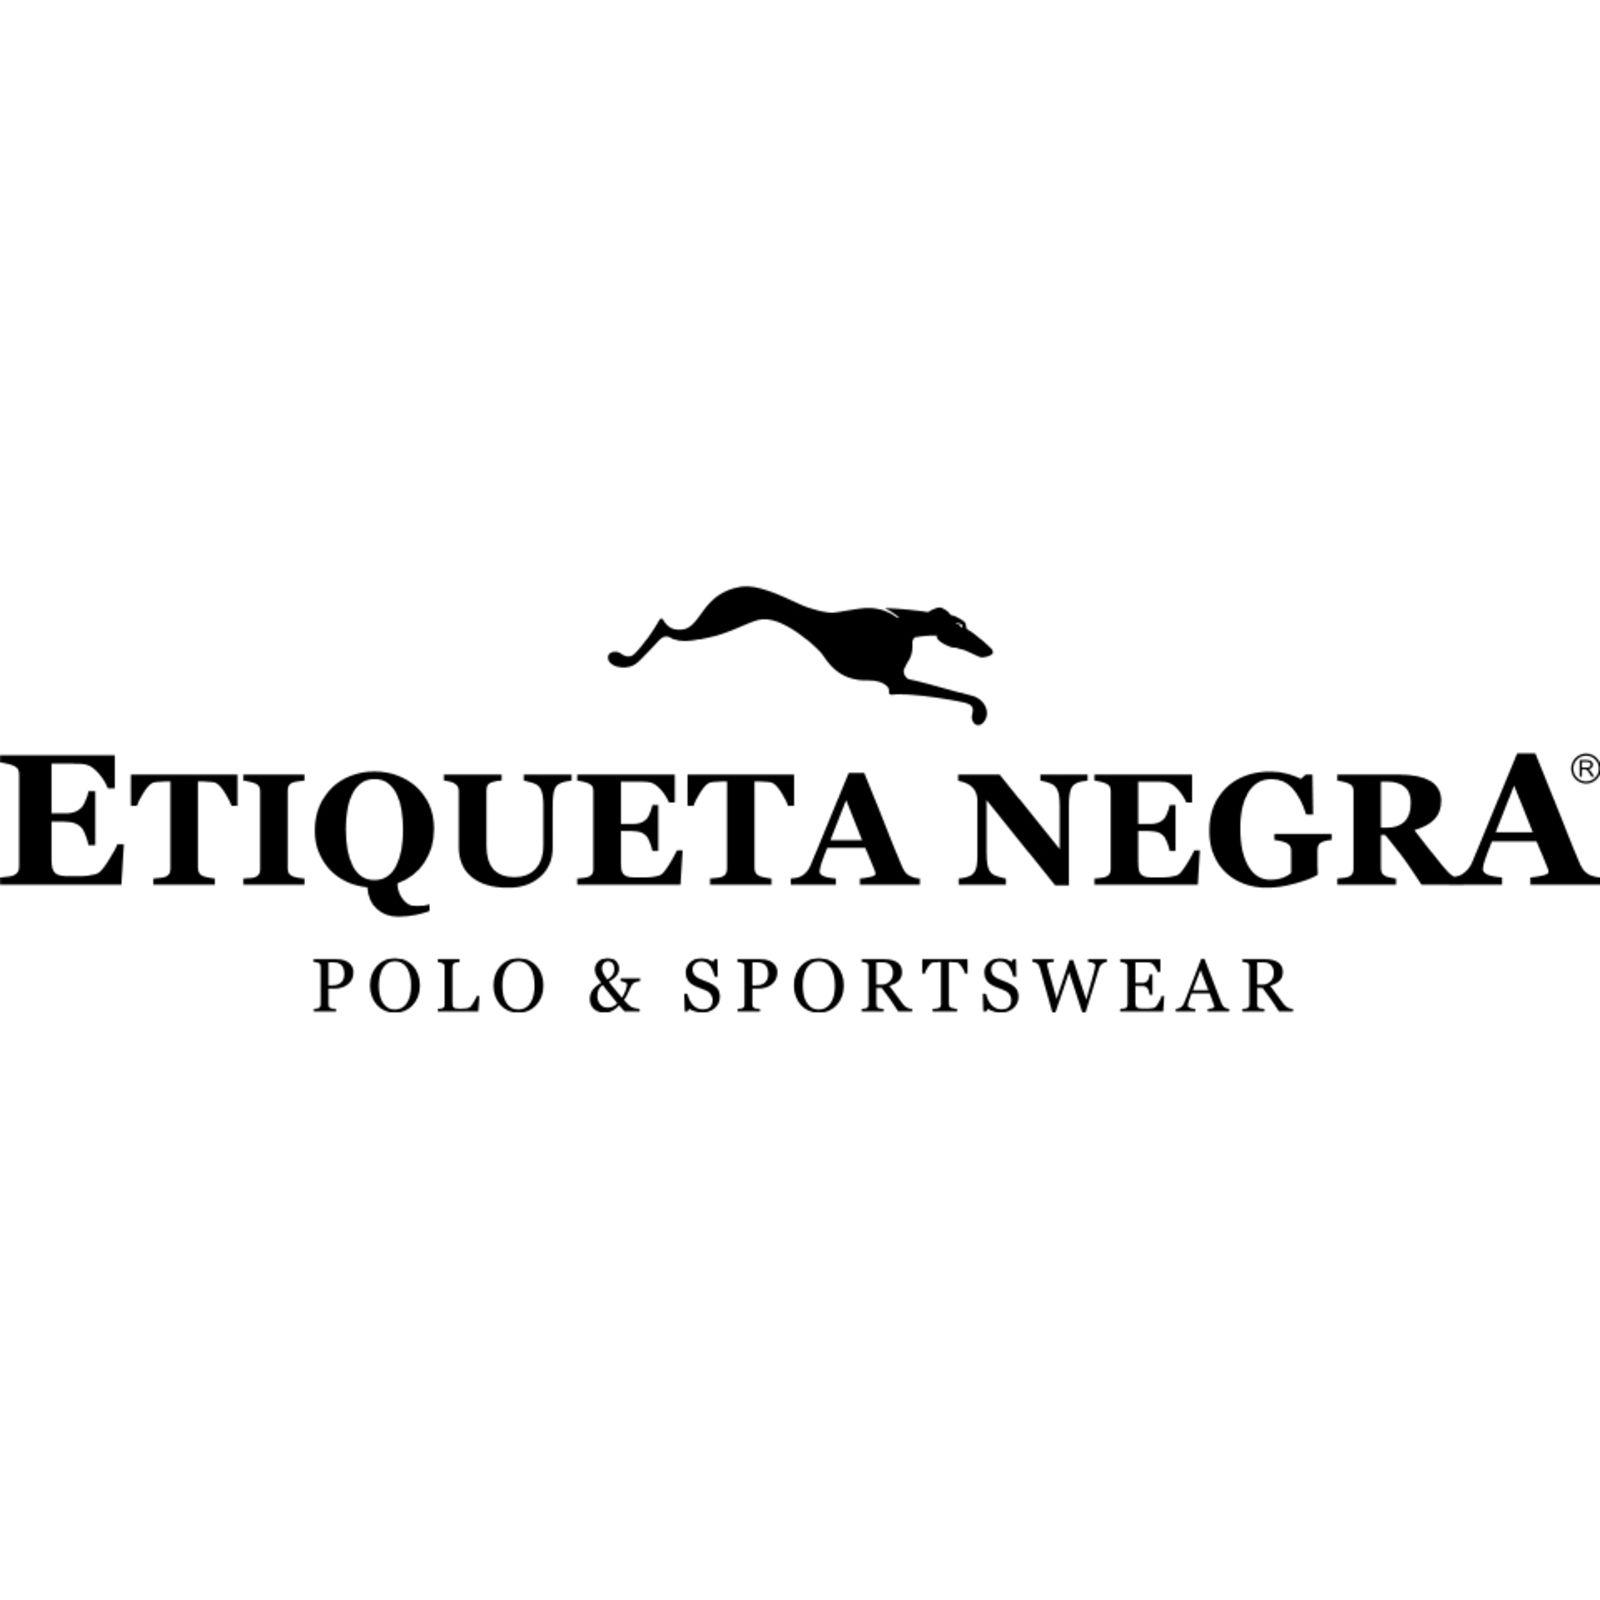 ETIQUETA NEGRA POLO & SPORTSWEAR